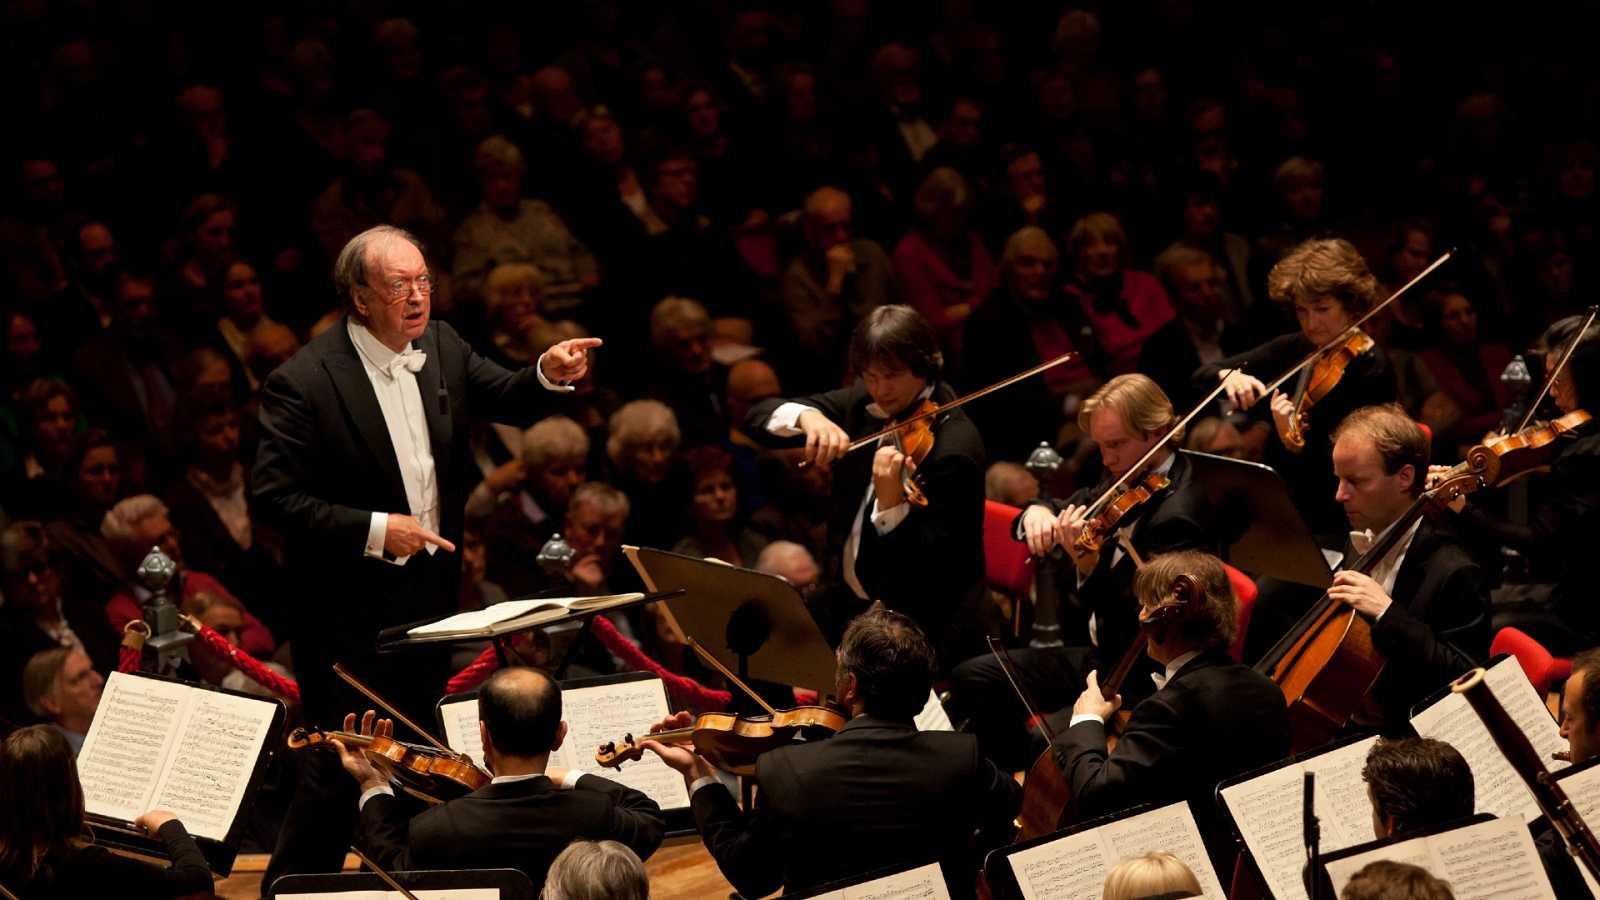 Gran repertorio - BEETHOVEN: Octava Sinfonía - 09/06/21 - escuchar ahora